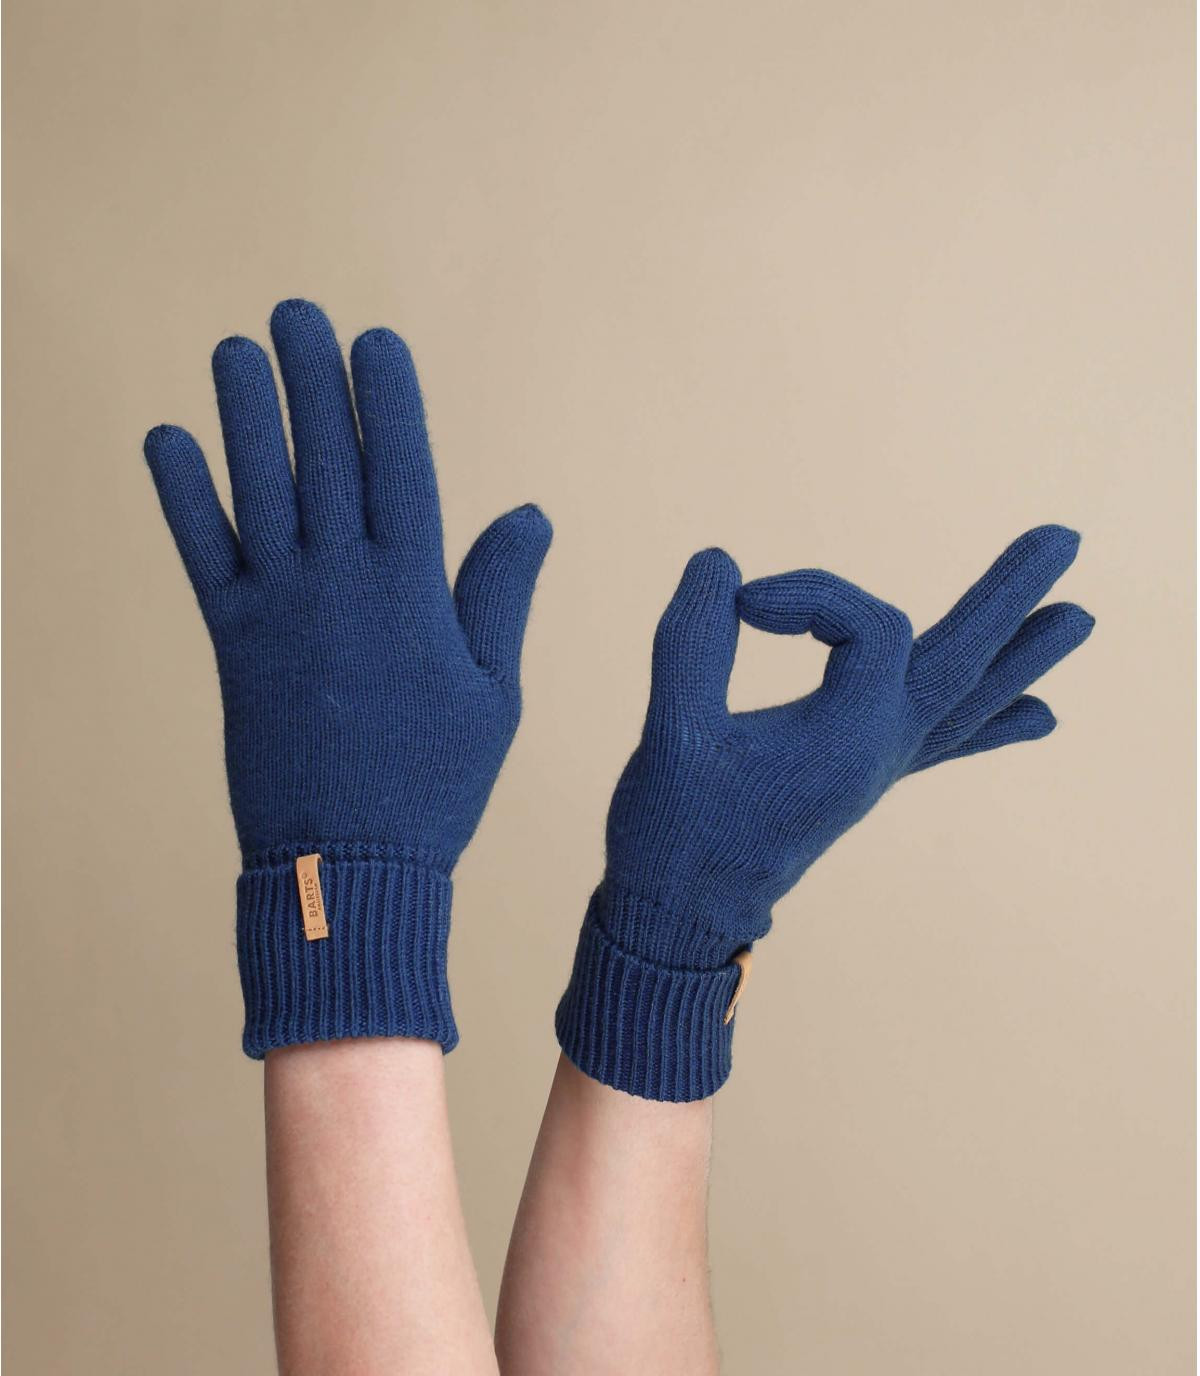 navy-blue gloves